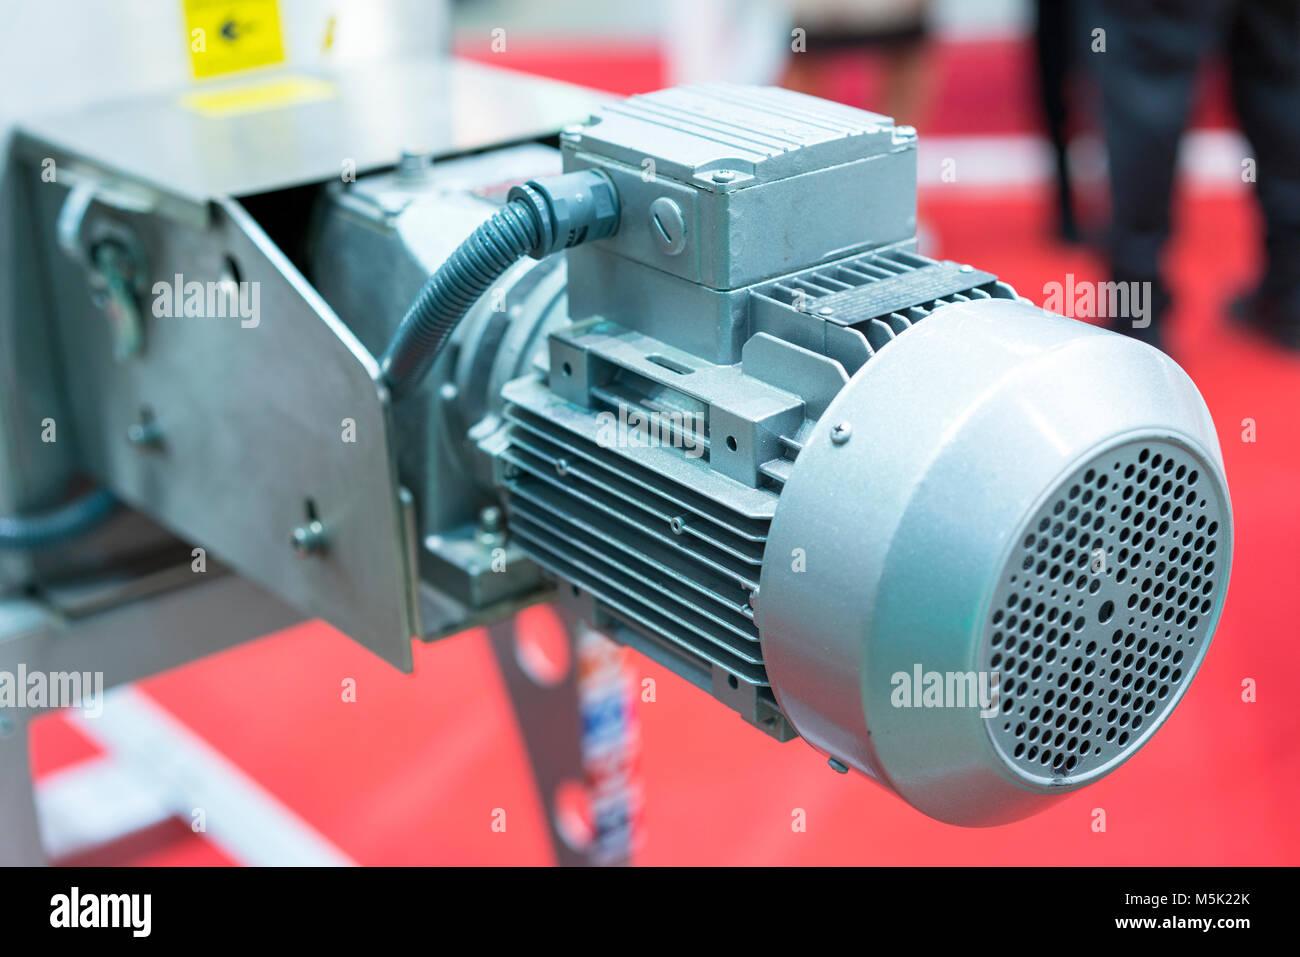 Large Electric Motor Stock Photos & Large Electric Motor Stock ...